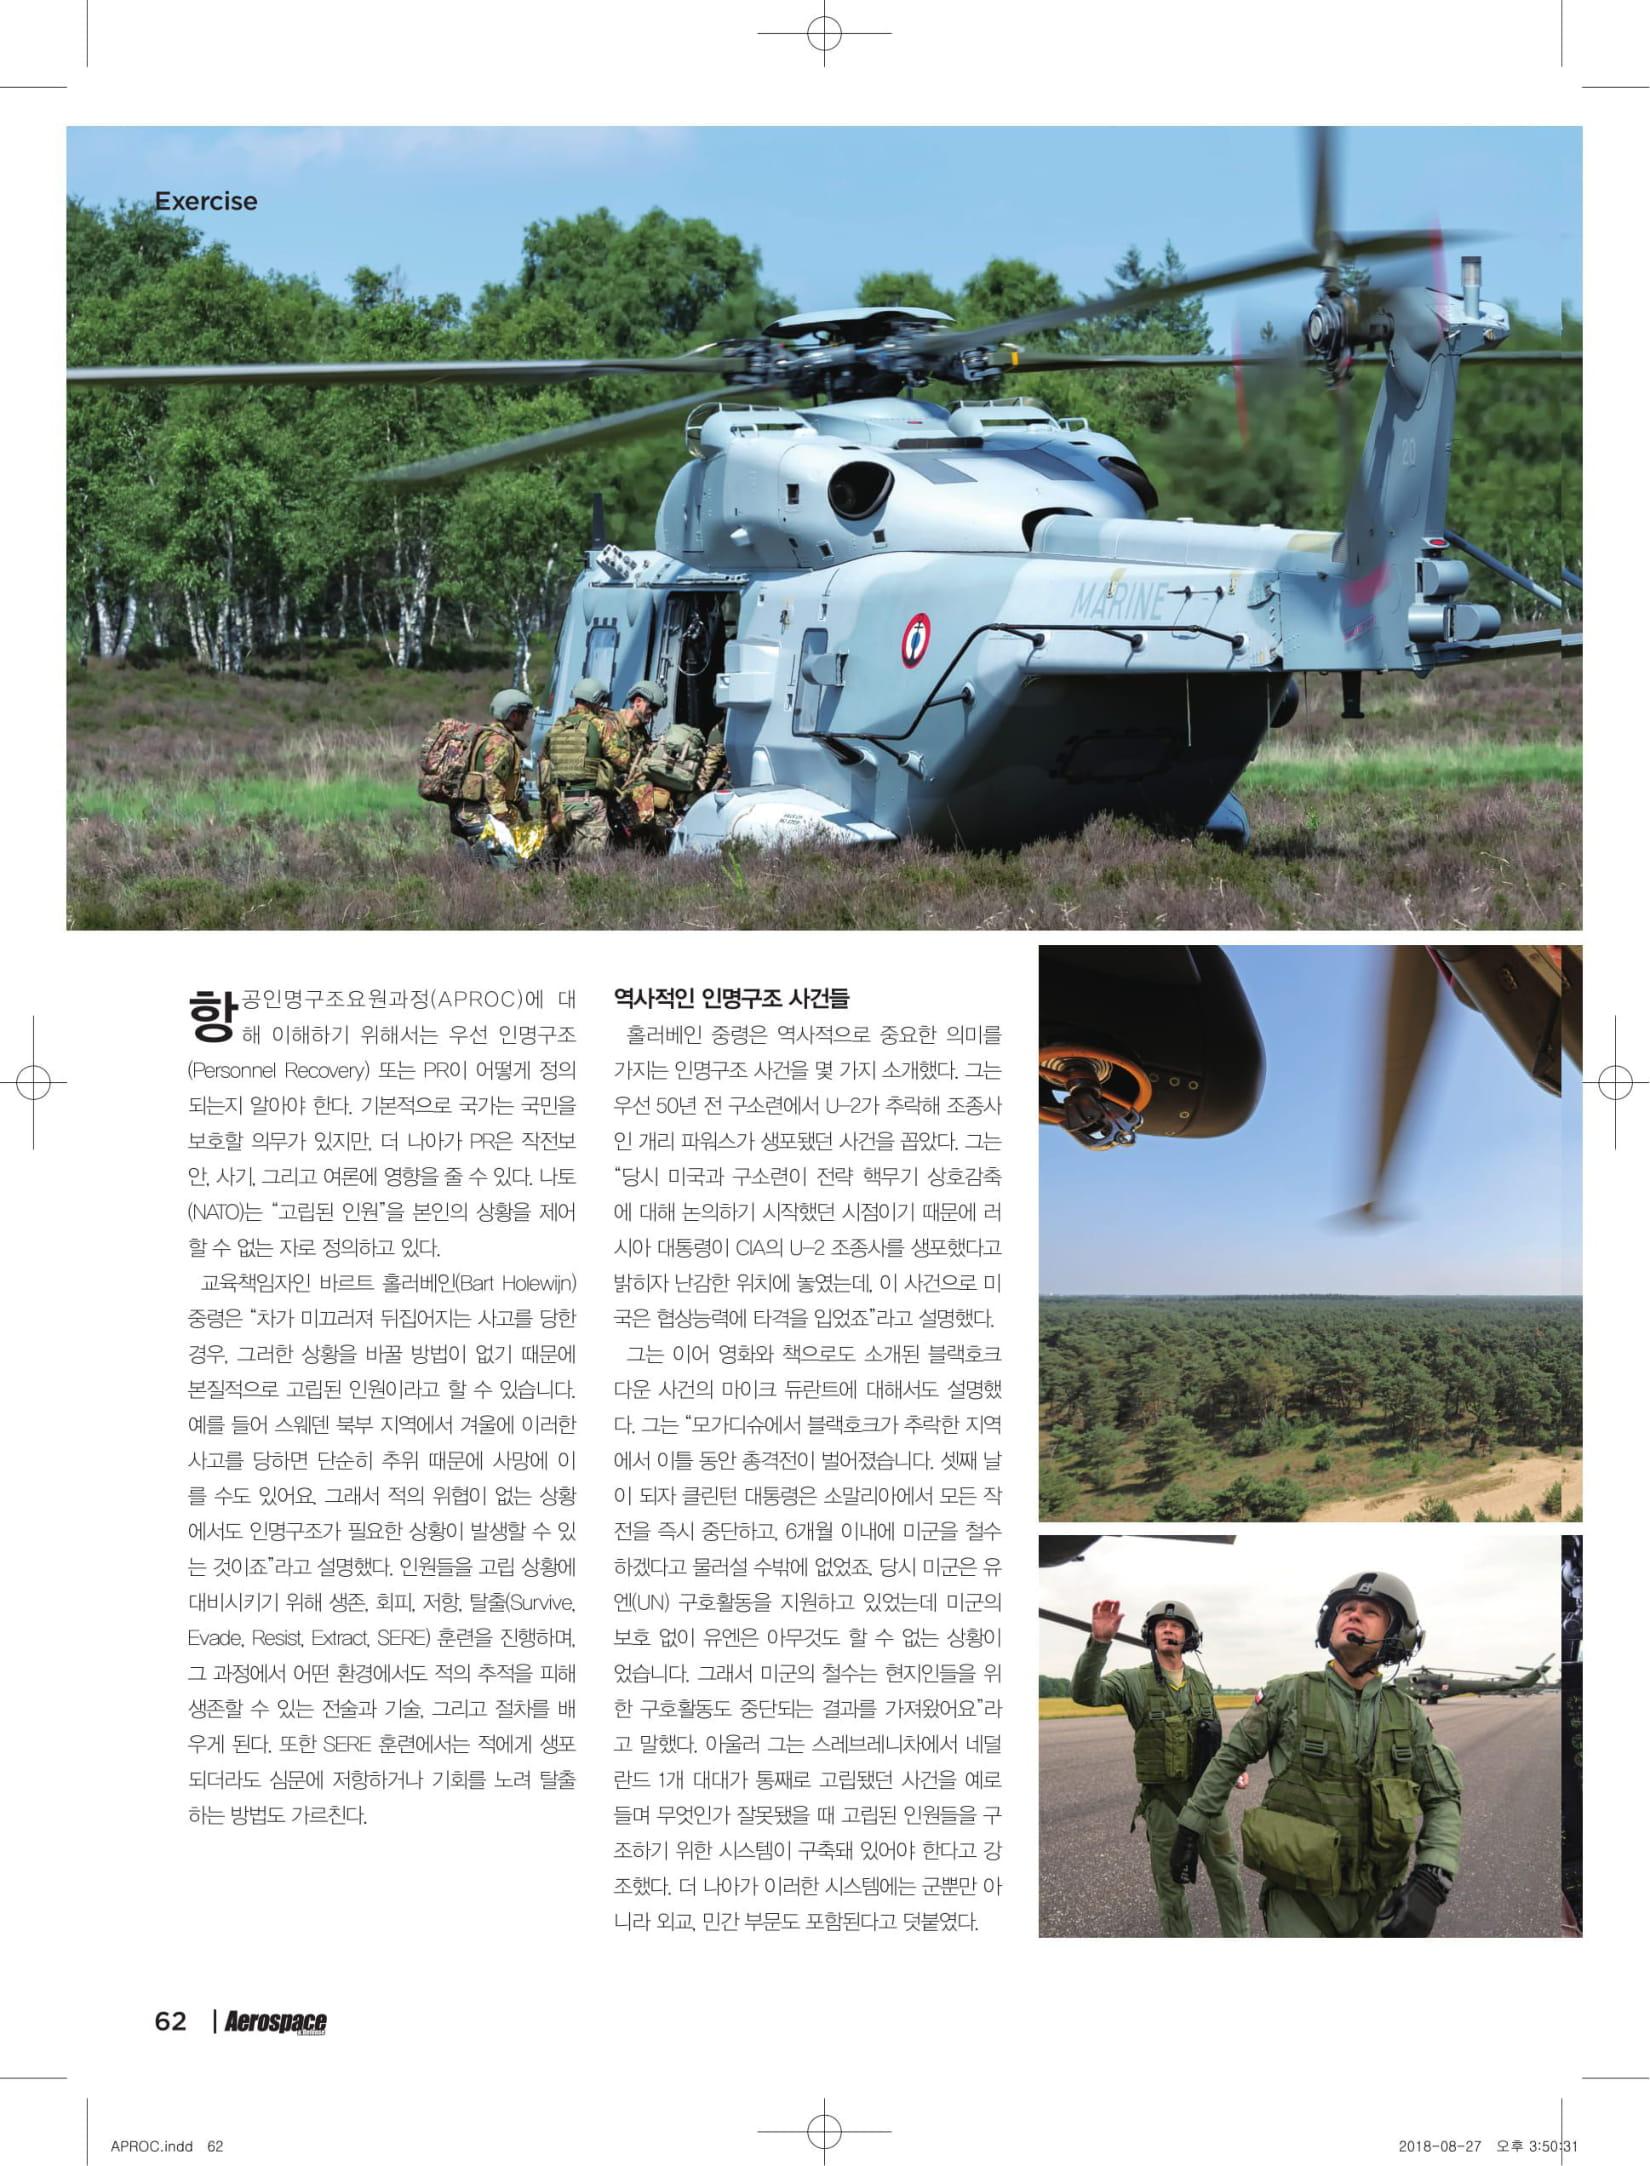 Aerospace & Defense (Korea)_APROC 2018-04